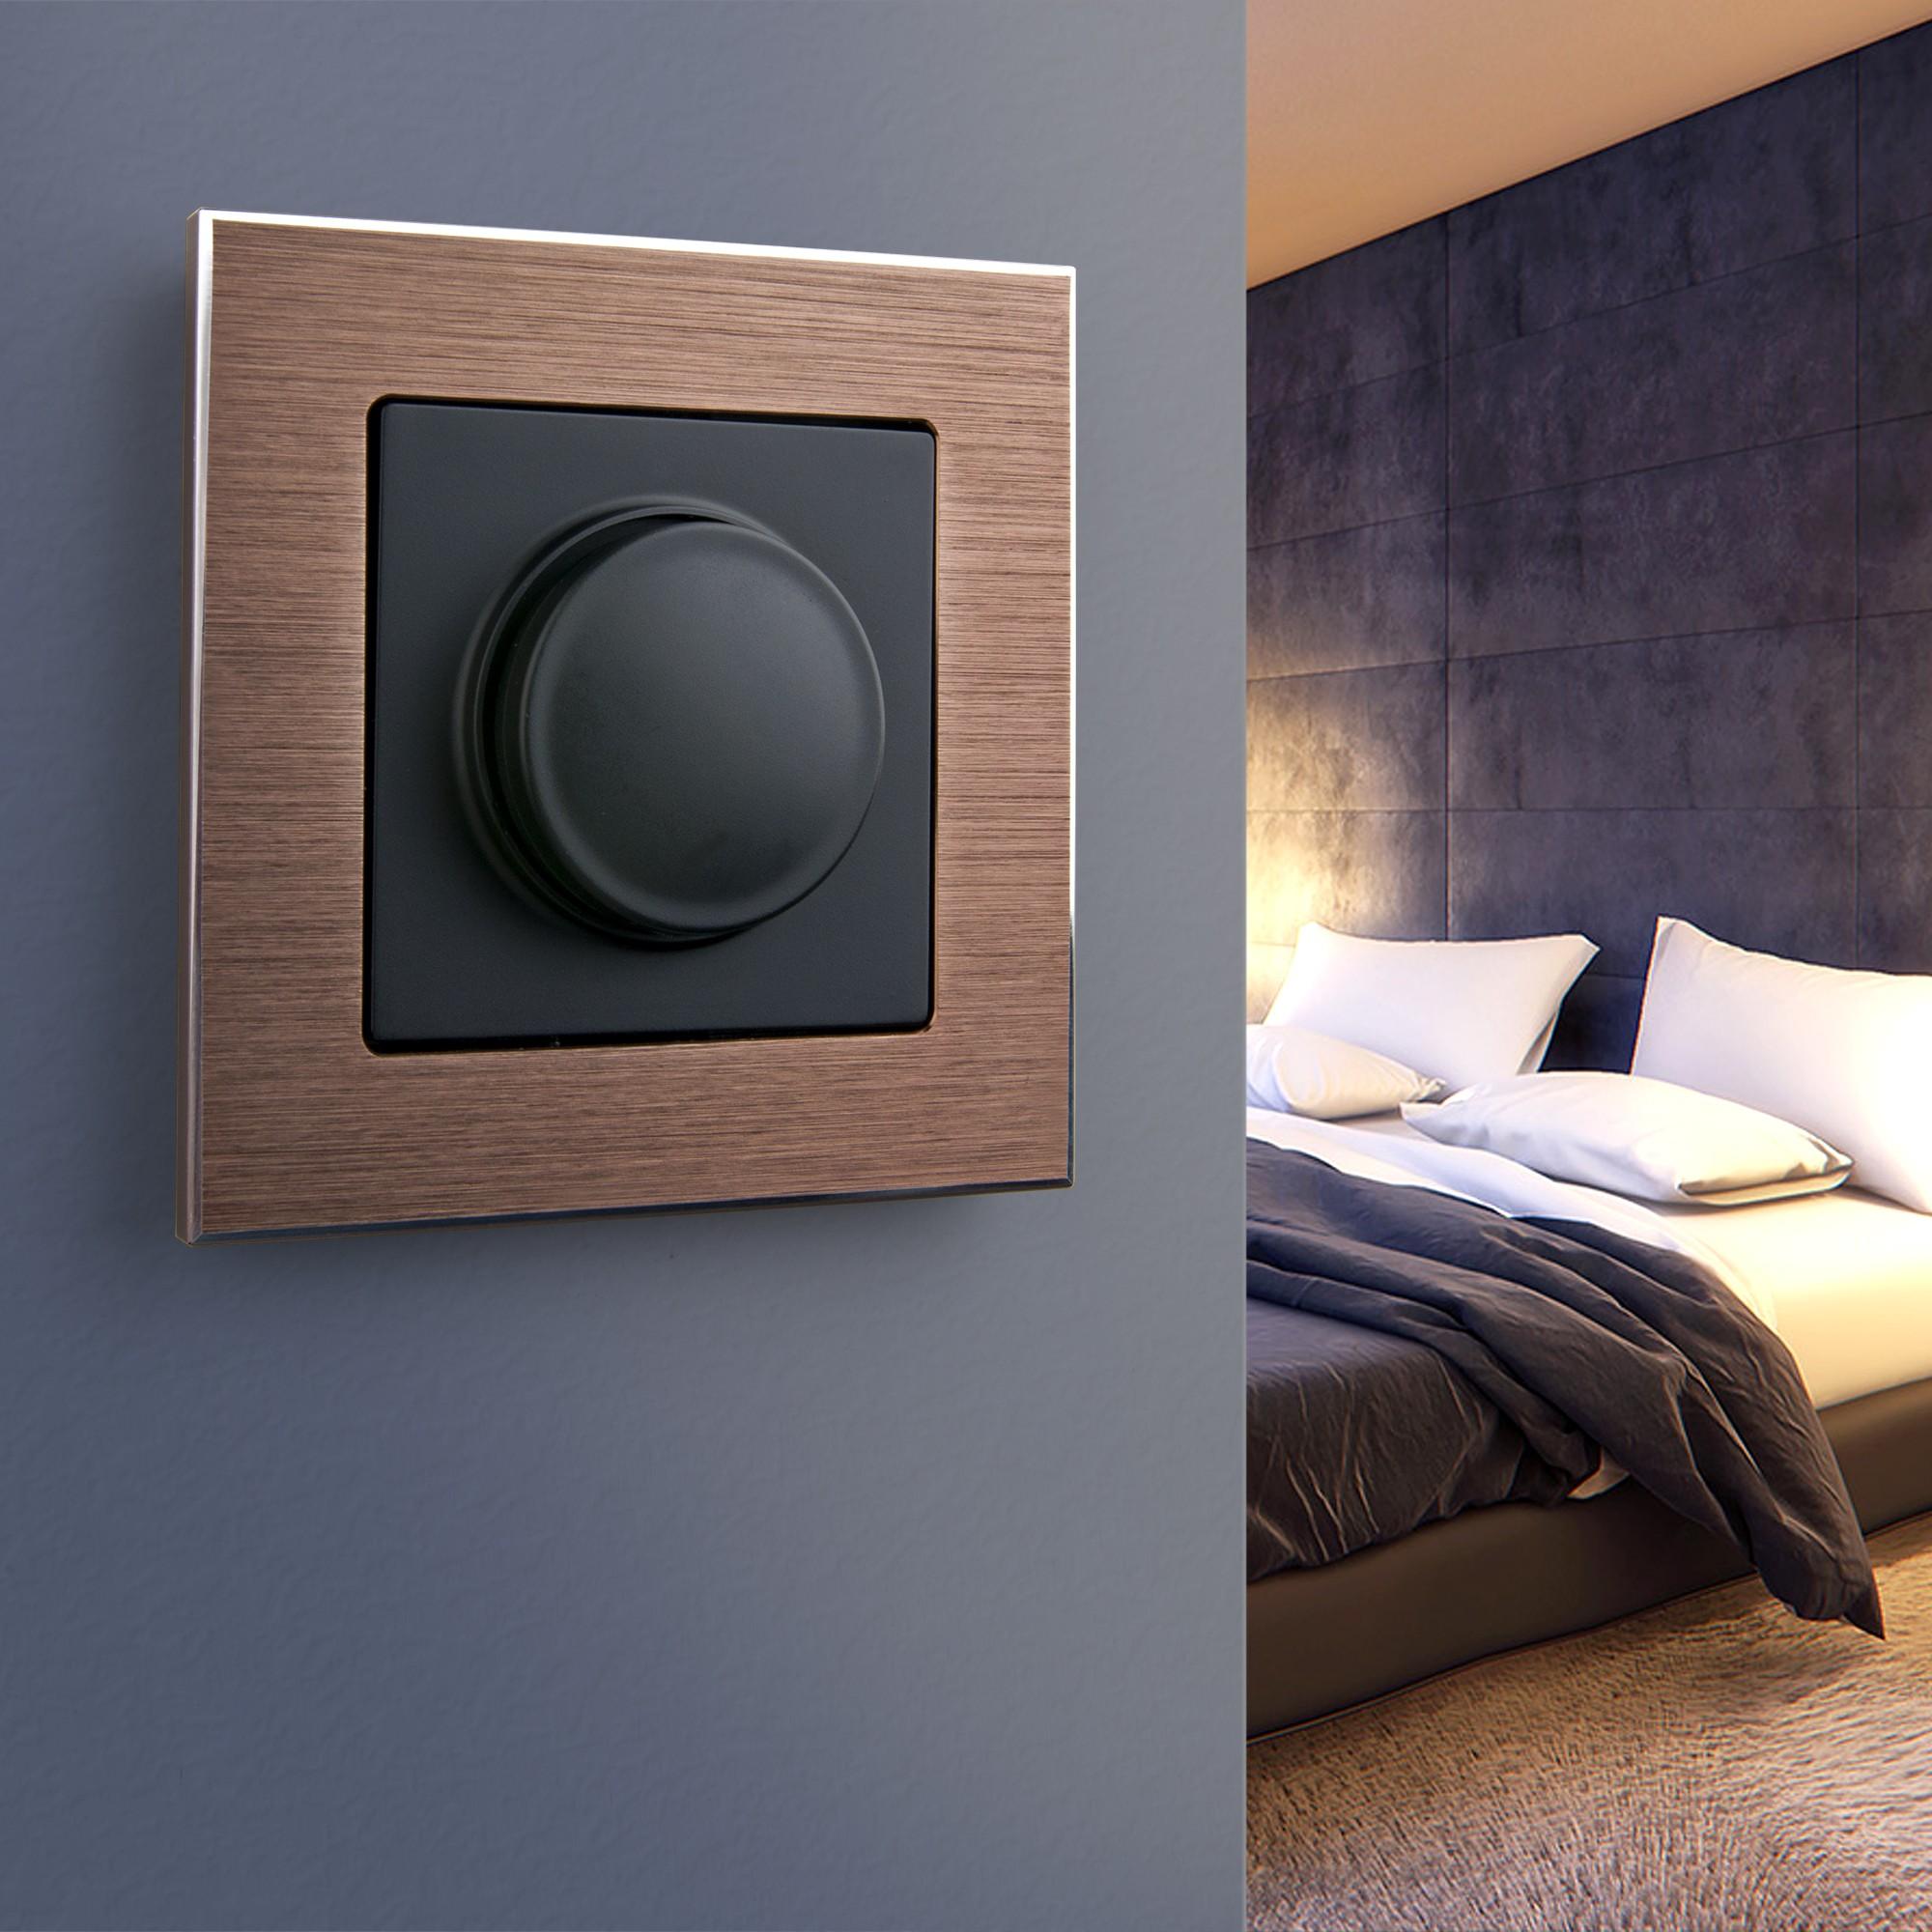 WL11-Frame-01 / Рамка на 1 пост (коричневый алюминий)